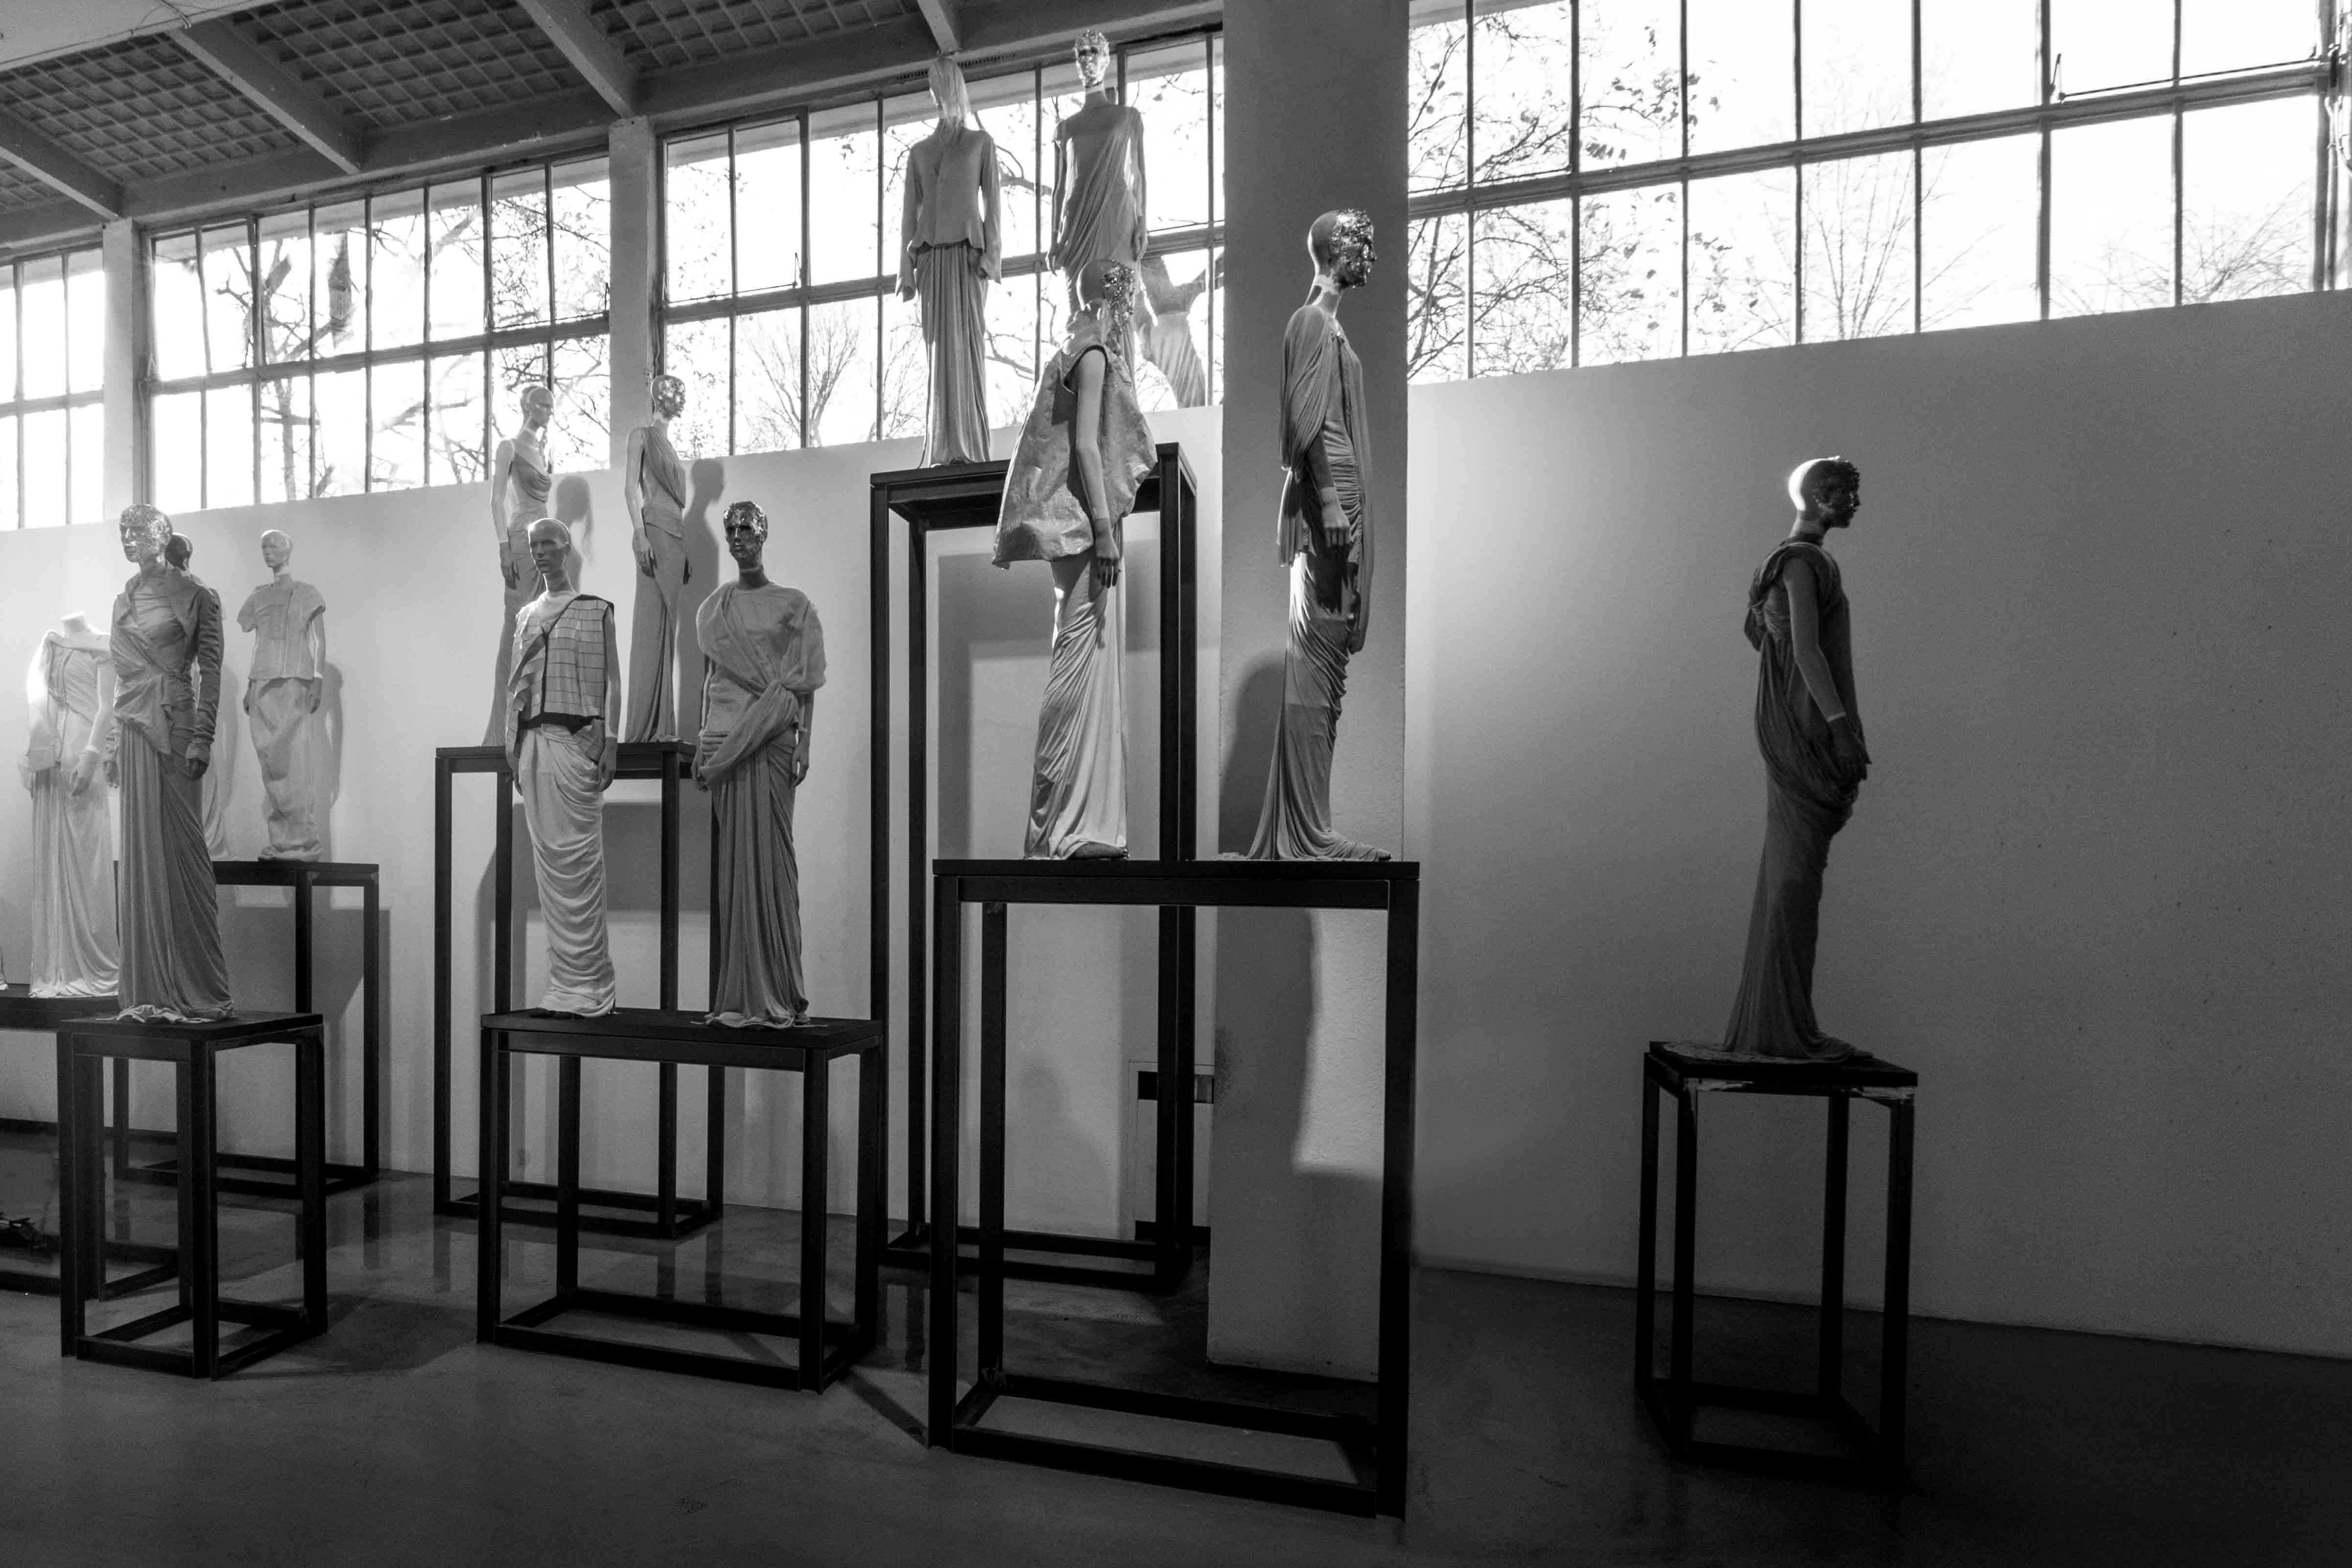 Vue de l'exposition Subhuman Inhuman Superhuman, photo : Owenscorp